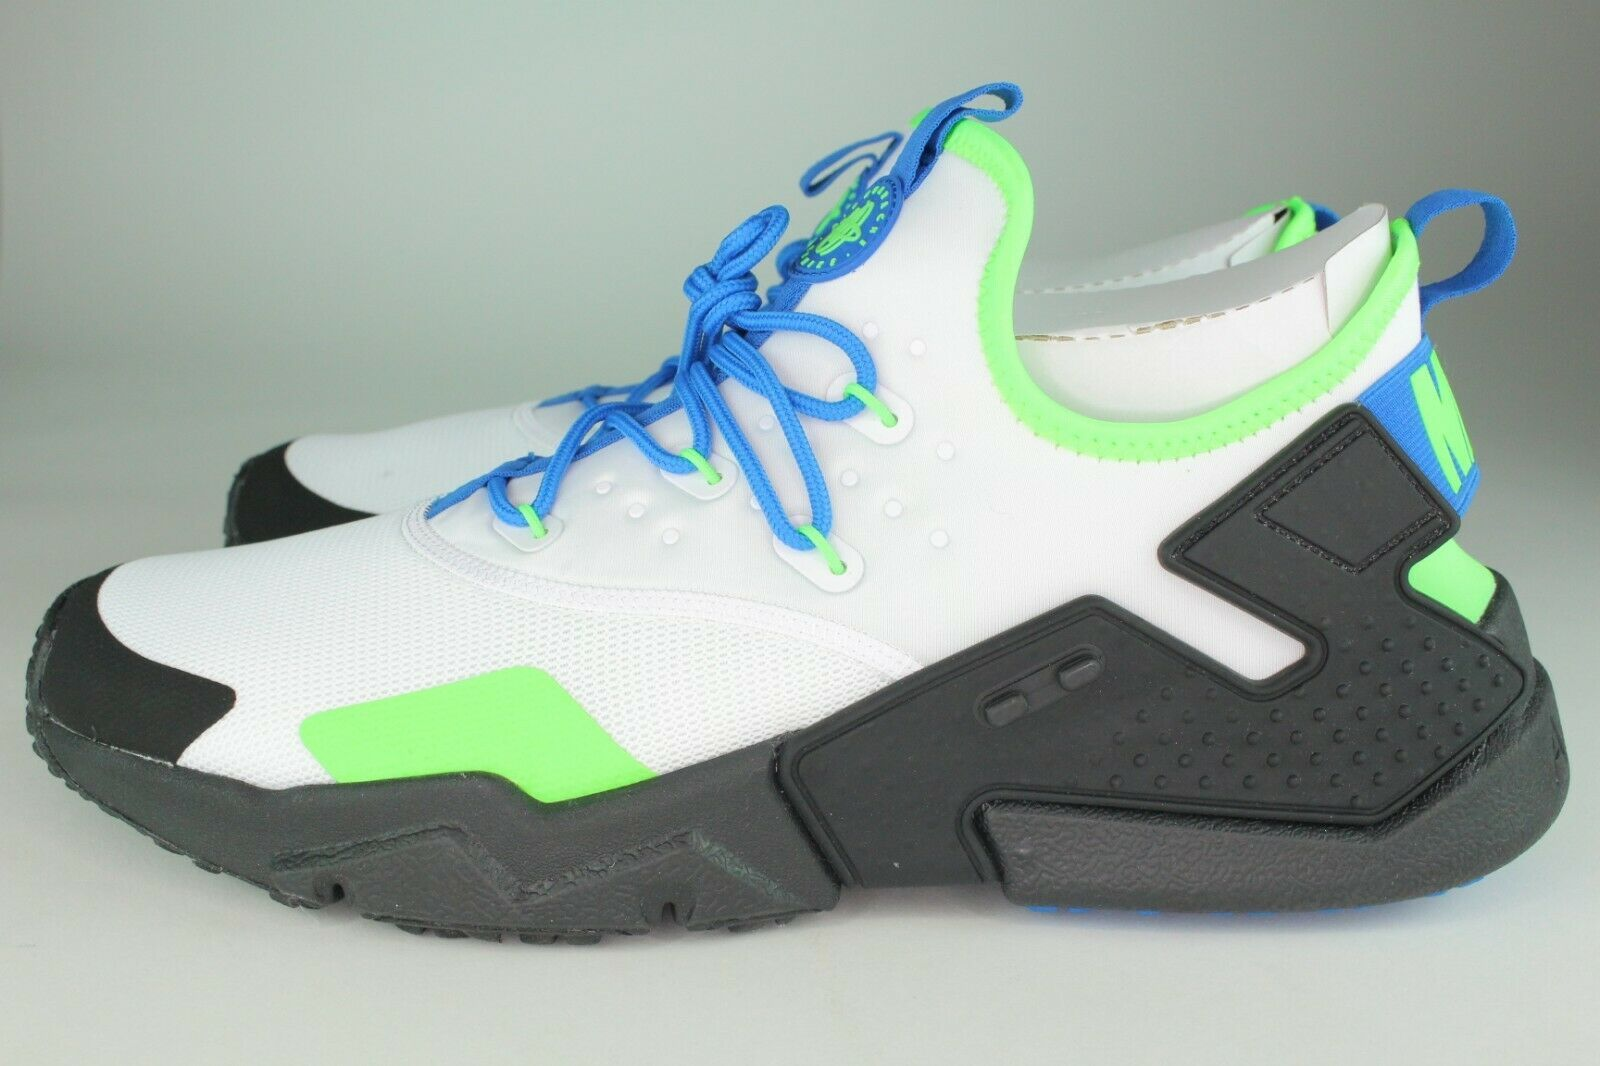 Nike Air Huarache Drift Grau Schwarz Herren